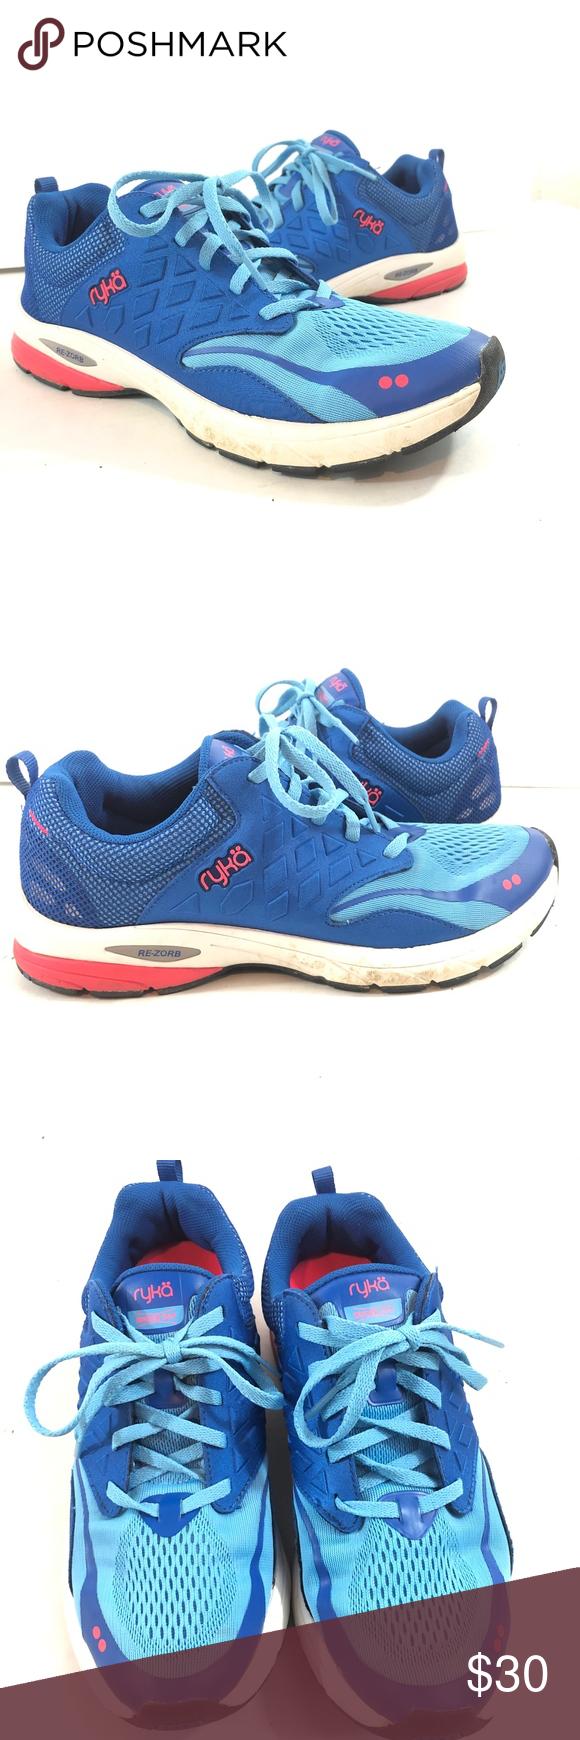 Ryka Re-Zorb Running Athletic Shoe